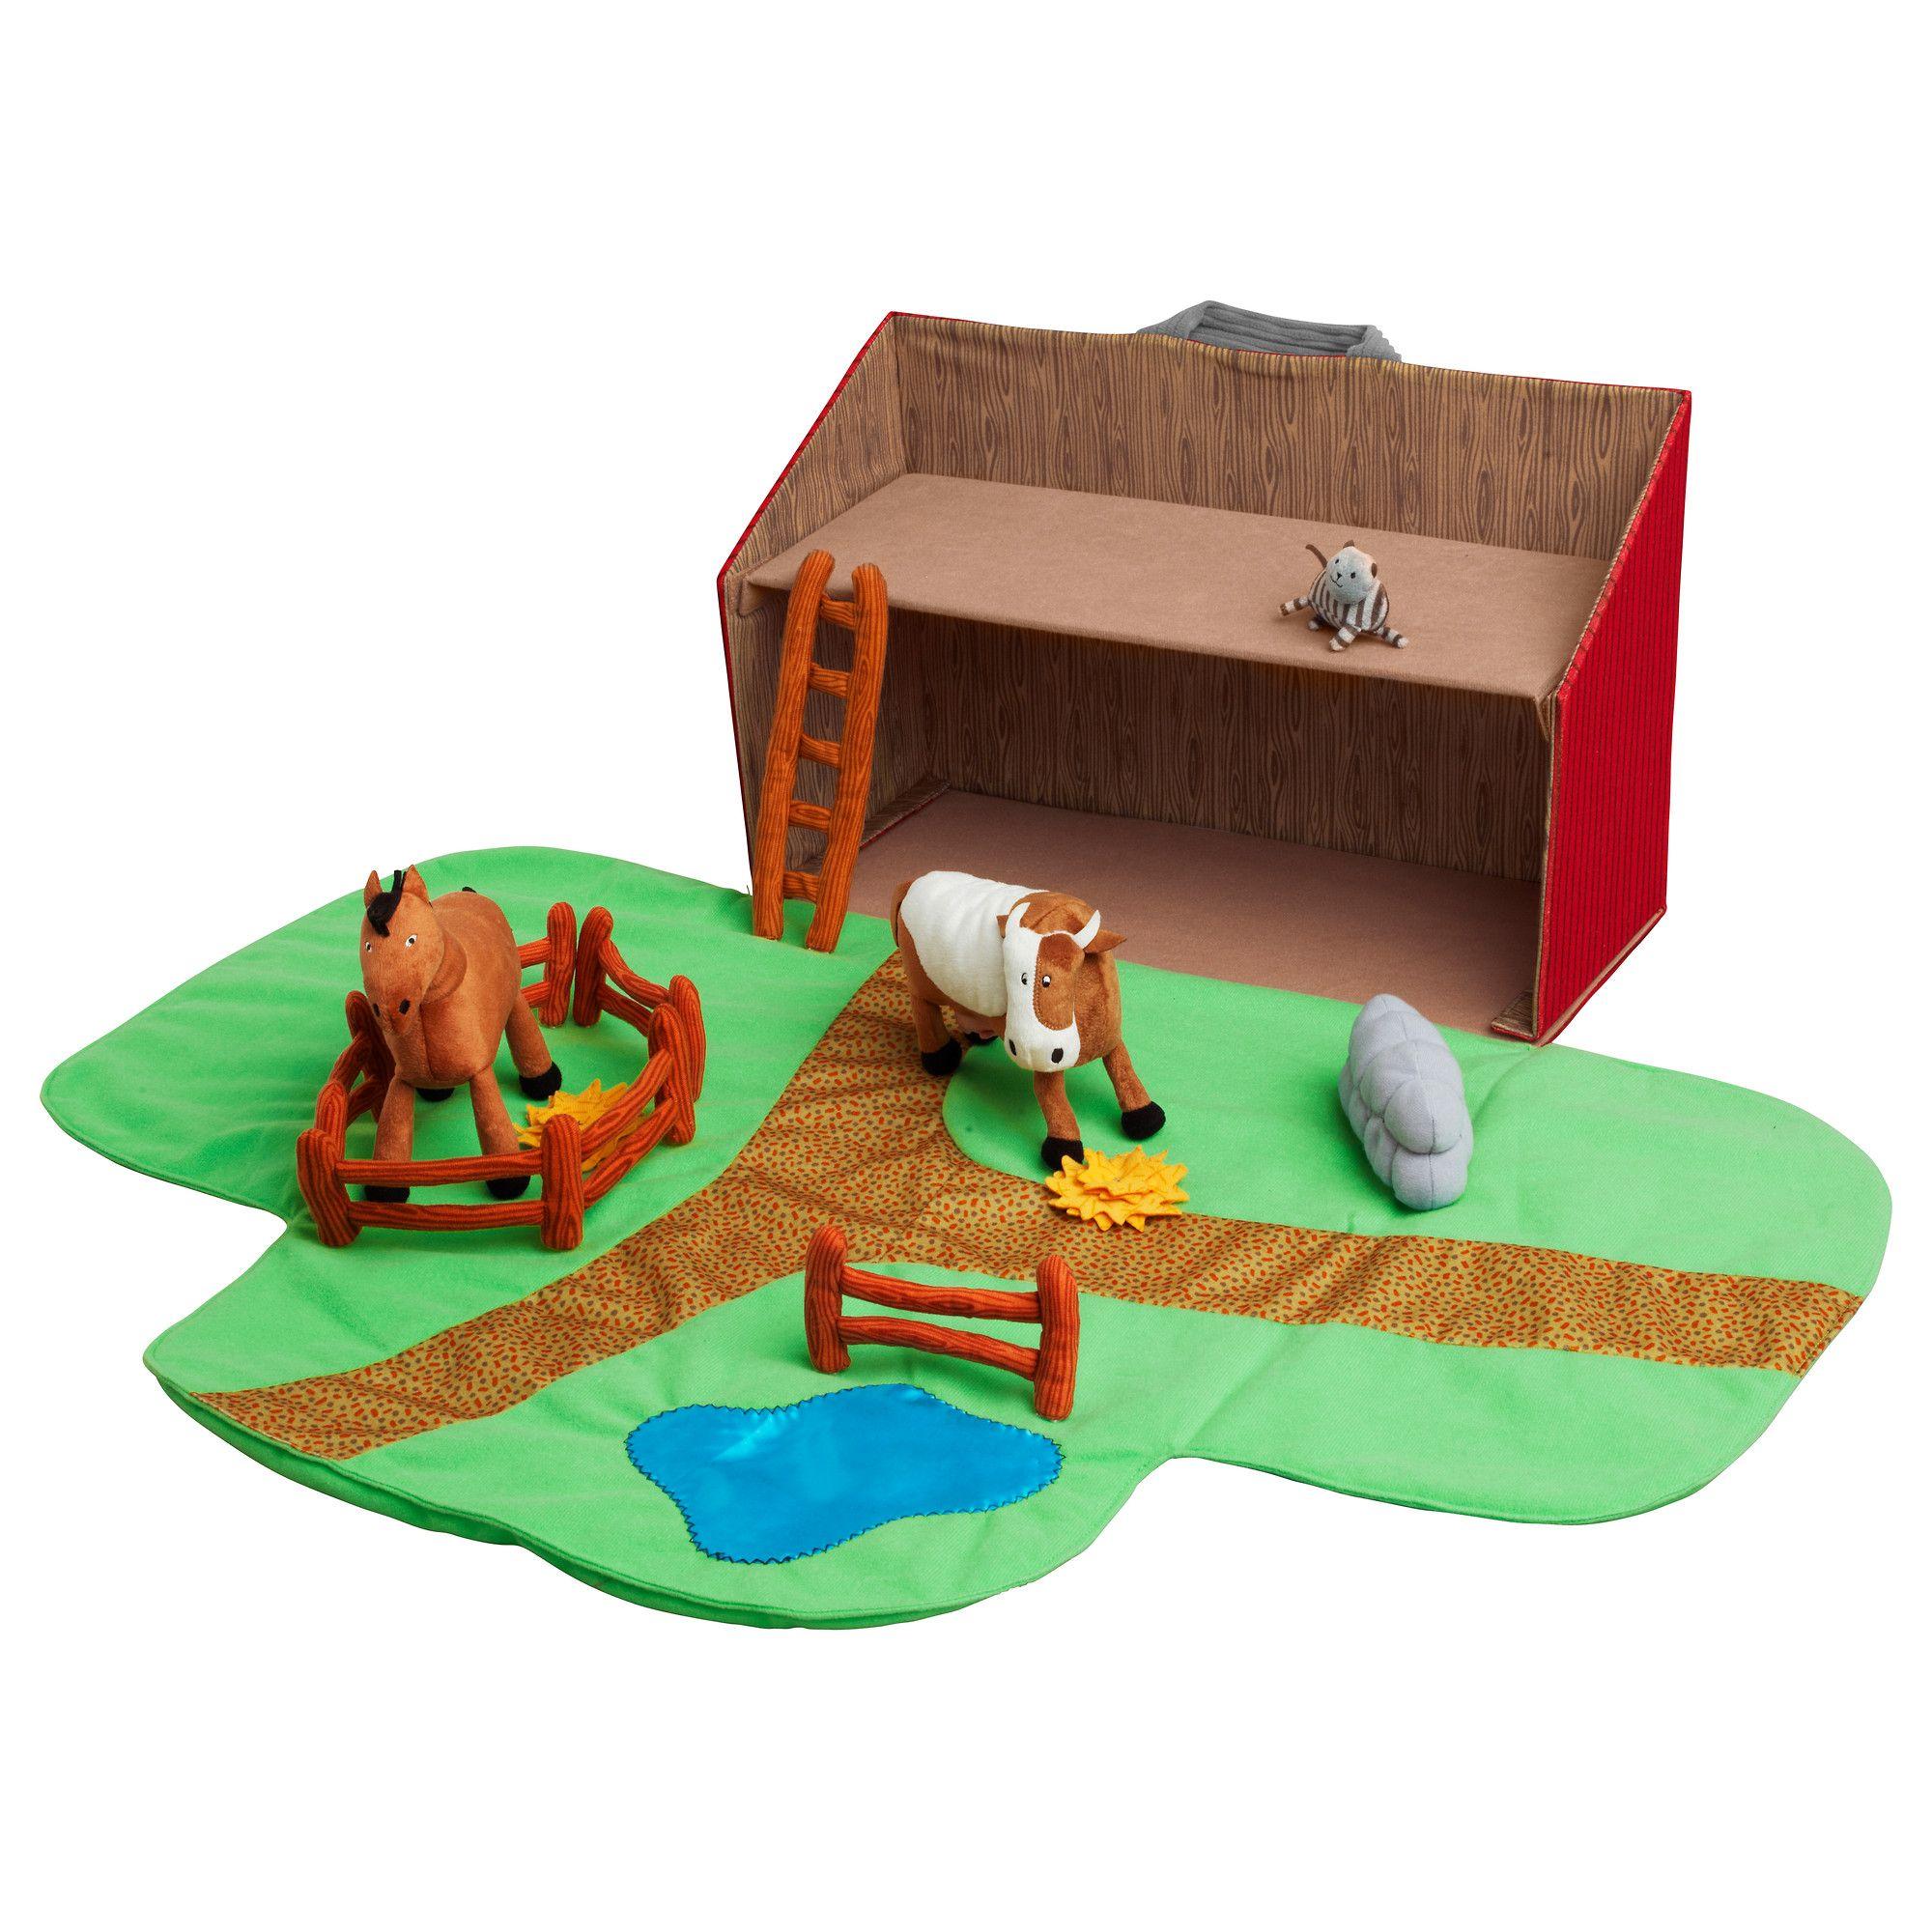 LANDET Farmhouse With Animals13 Piece Set